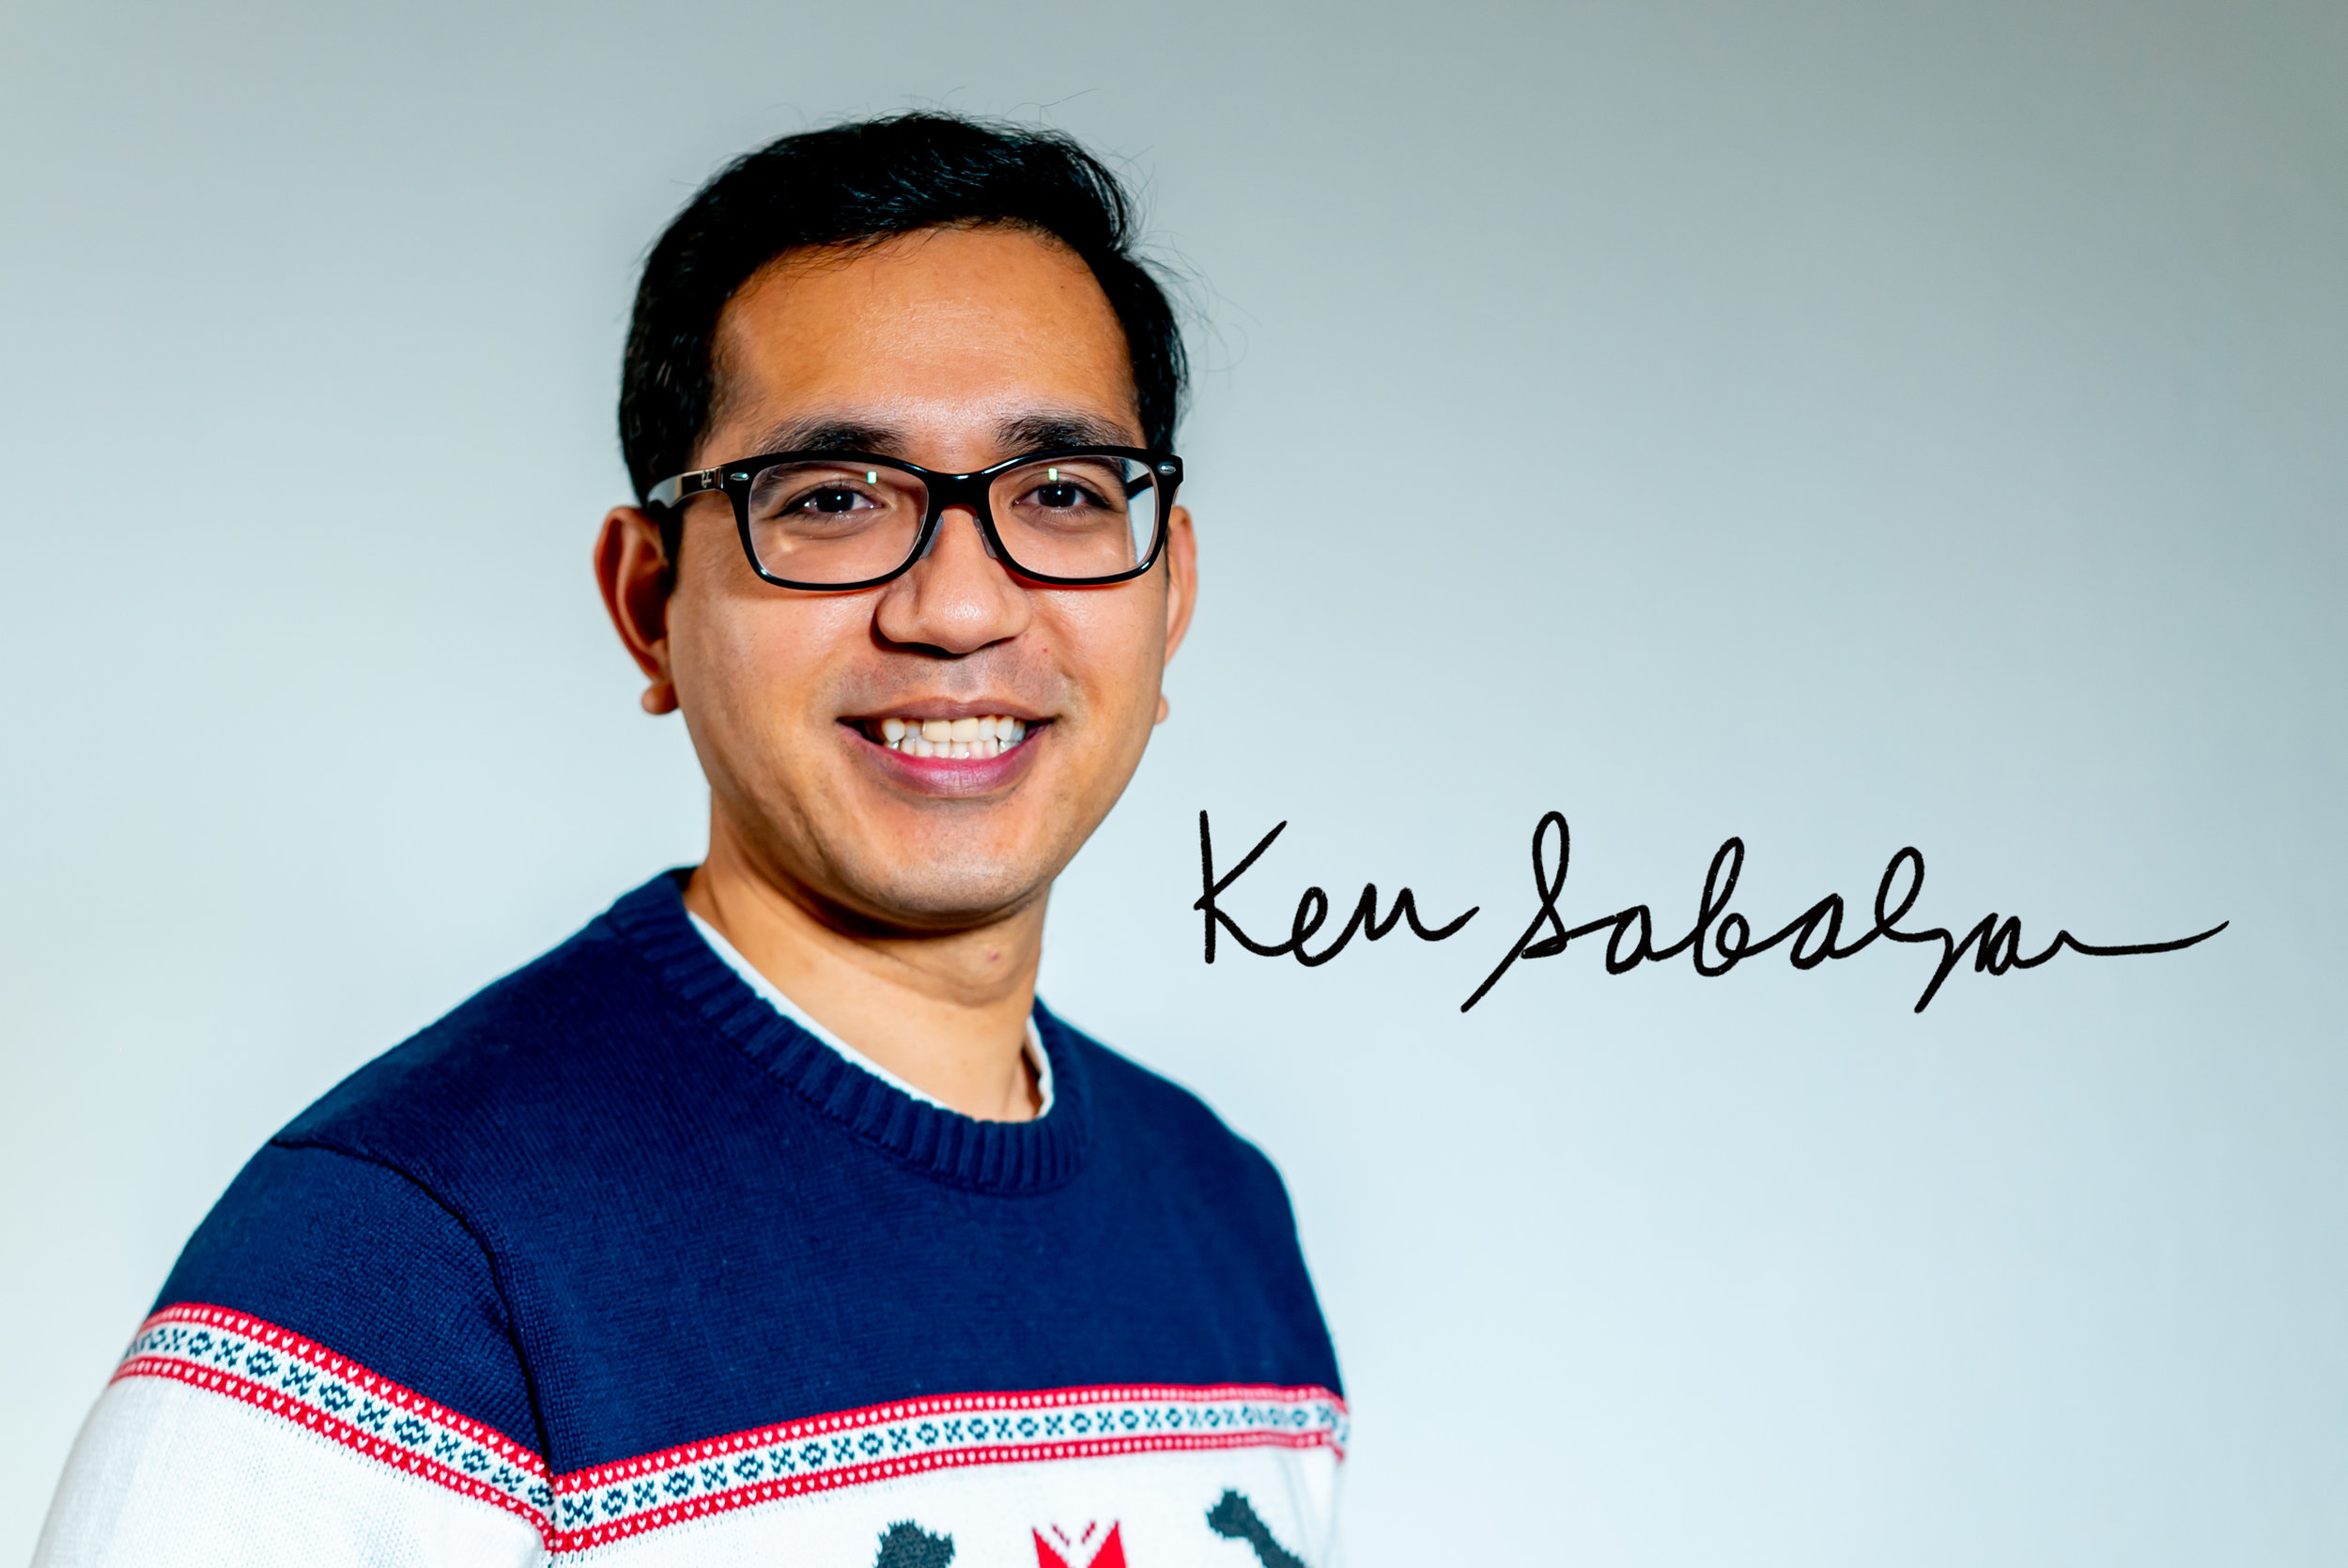 ken signature.jpg